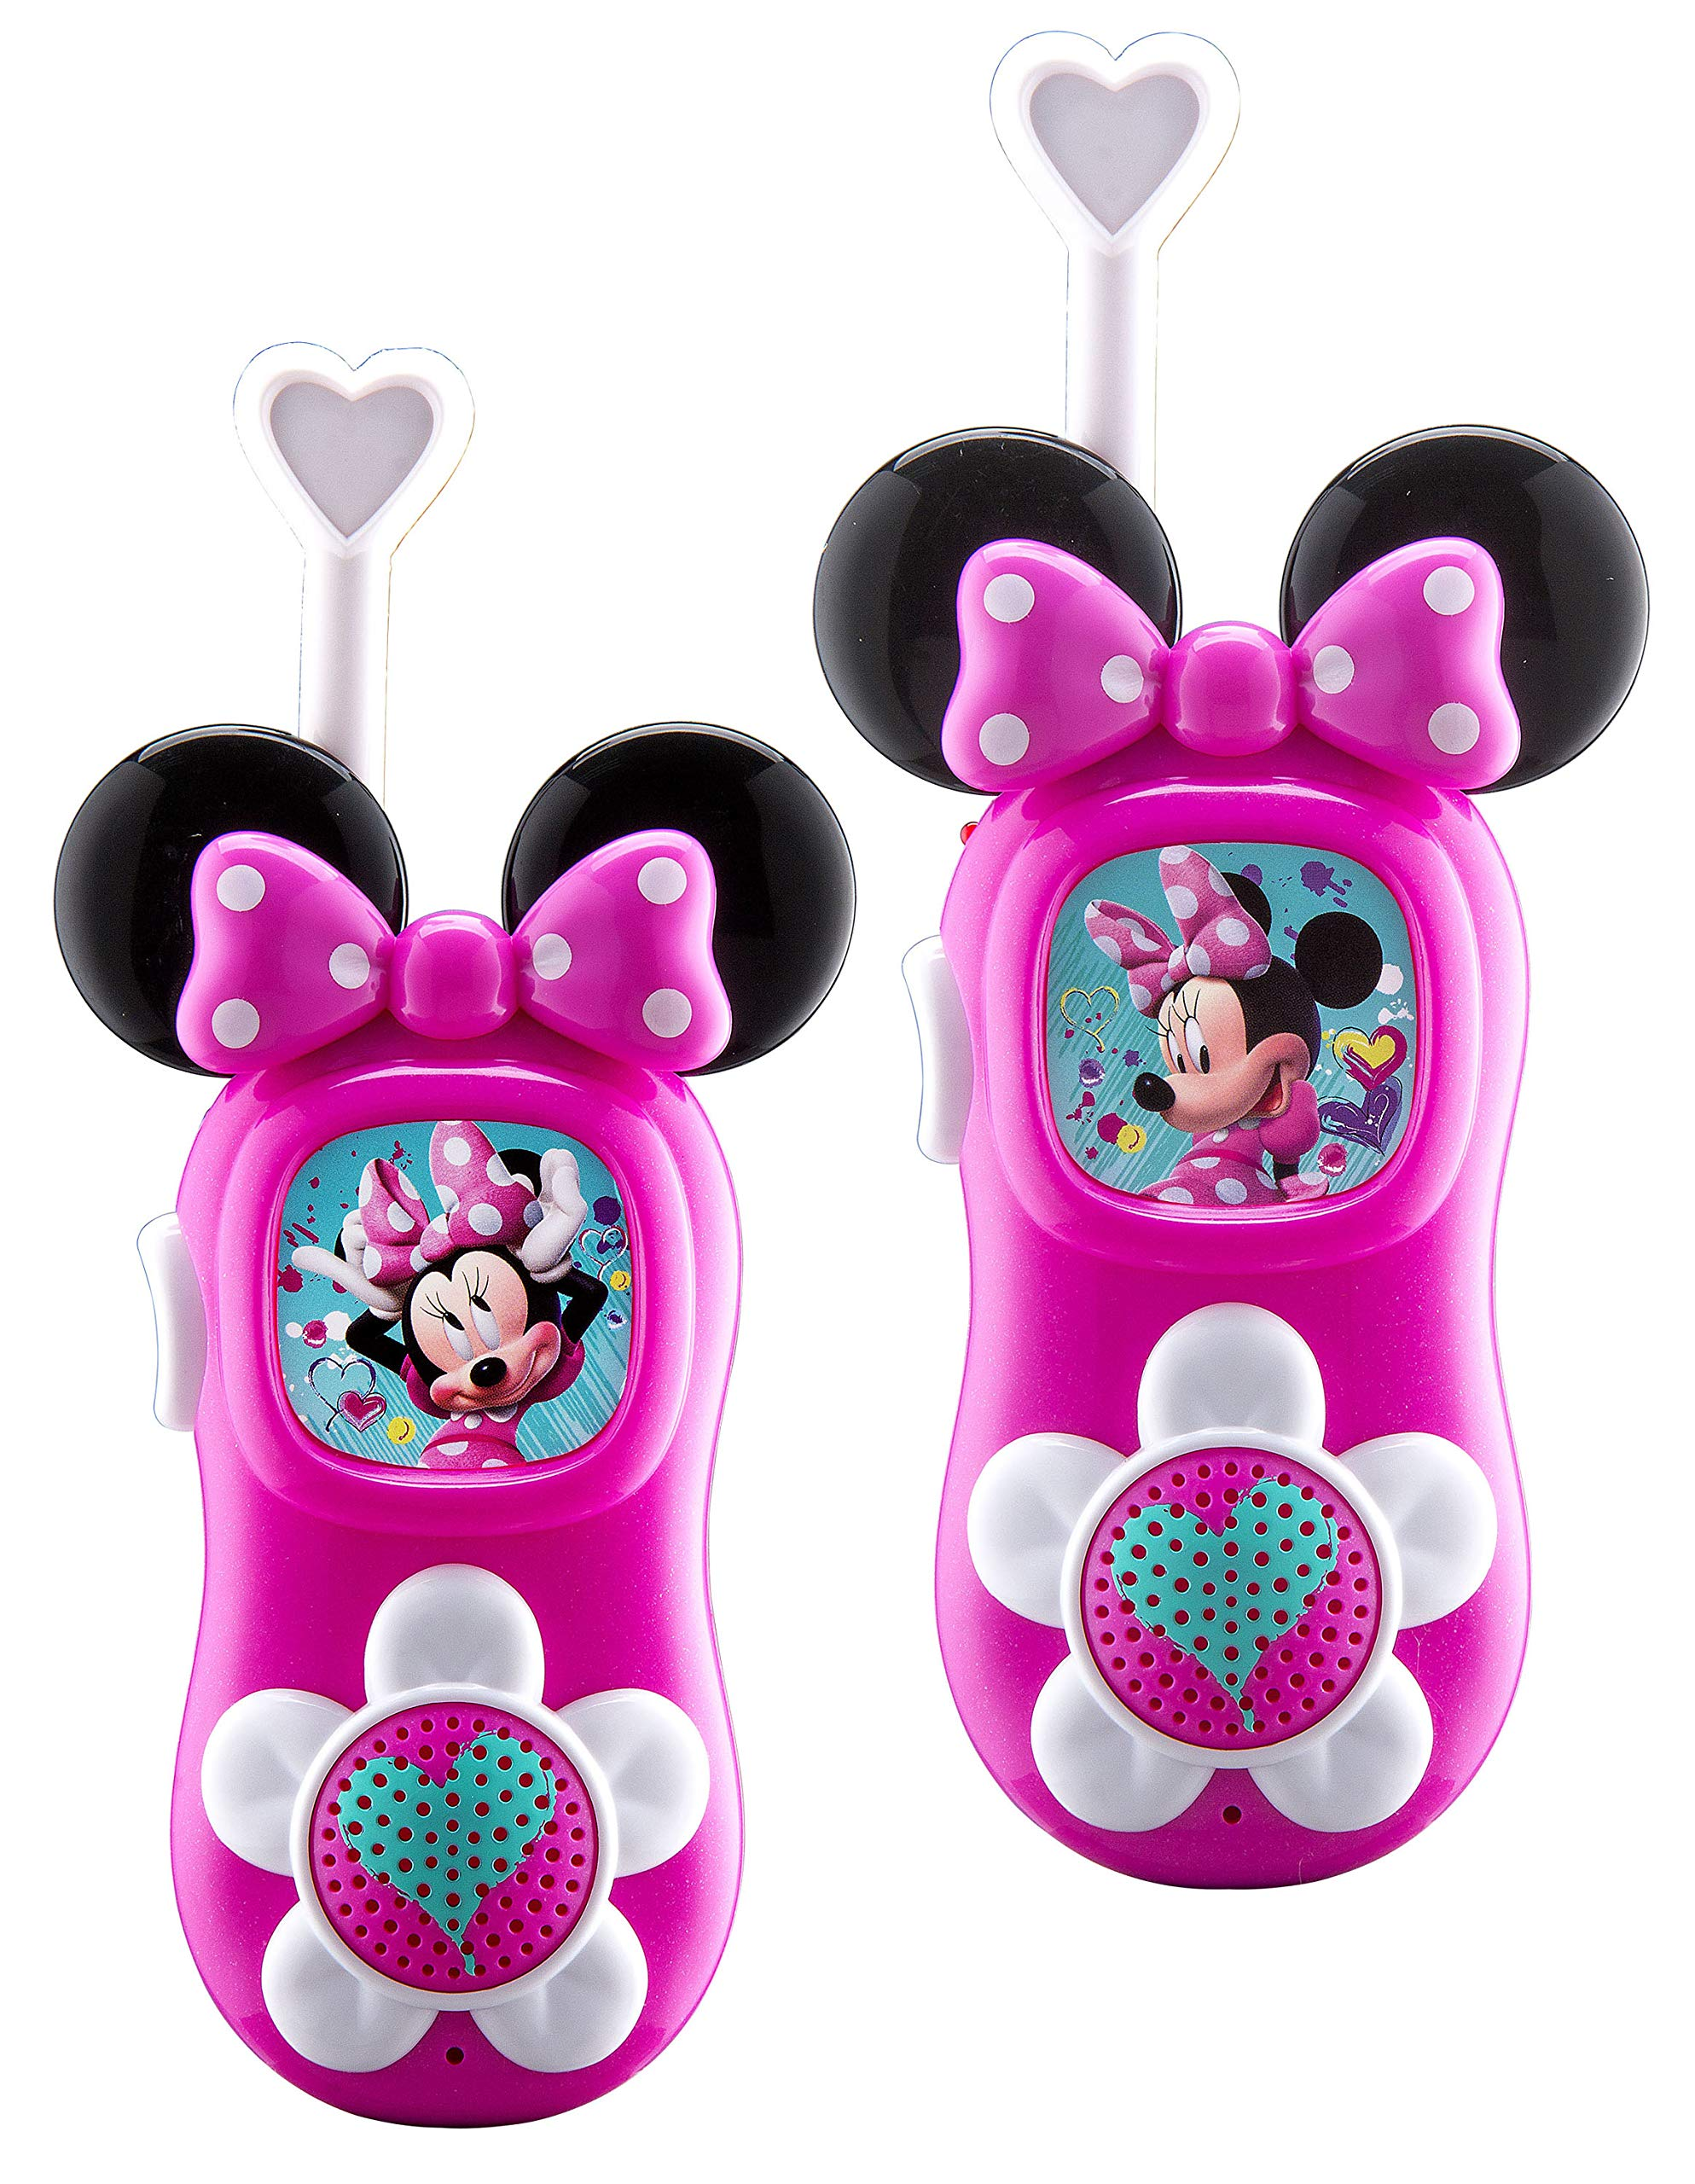 KIDdesigns 220 Minnie Mouse FRS Walkie Talkies for Kids Long Range Static Free, Pink (Pack of 2)